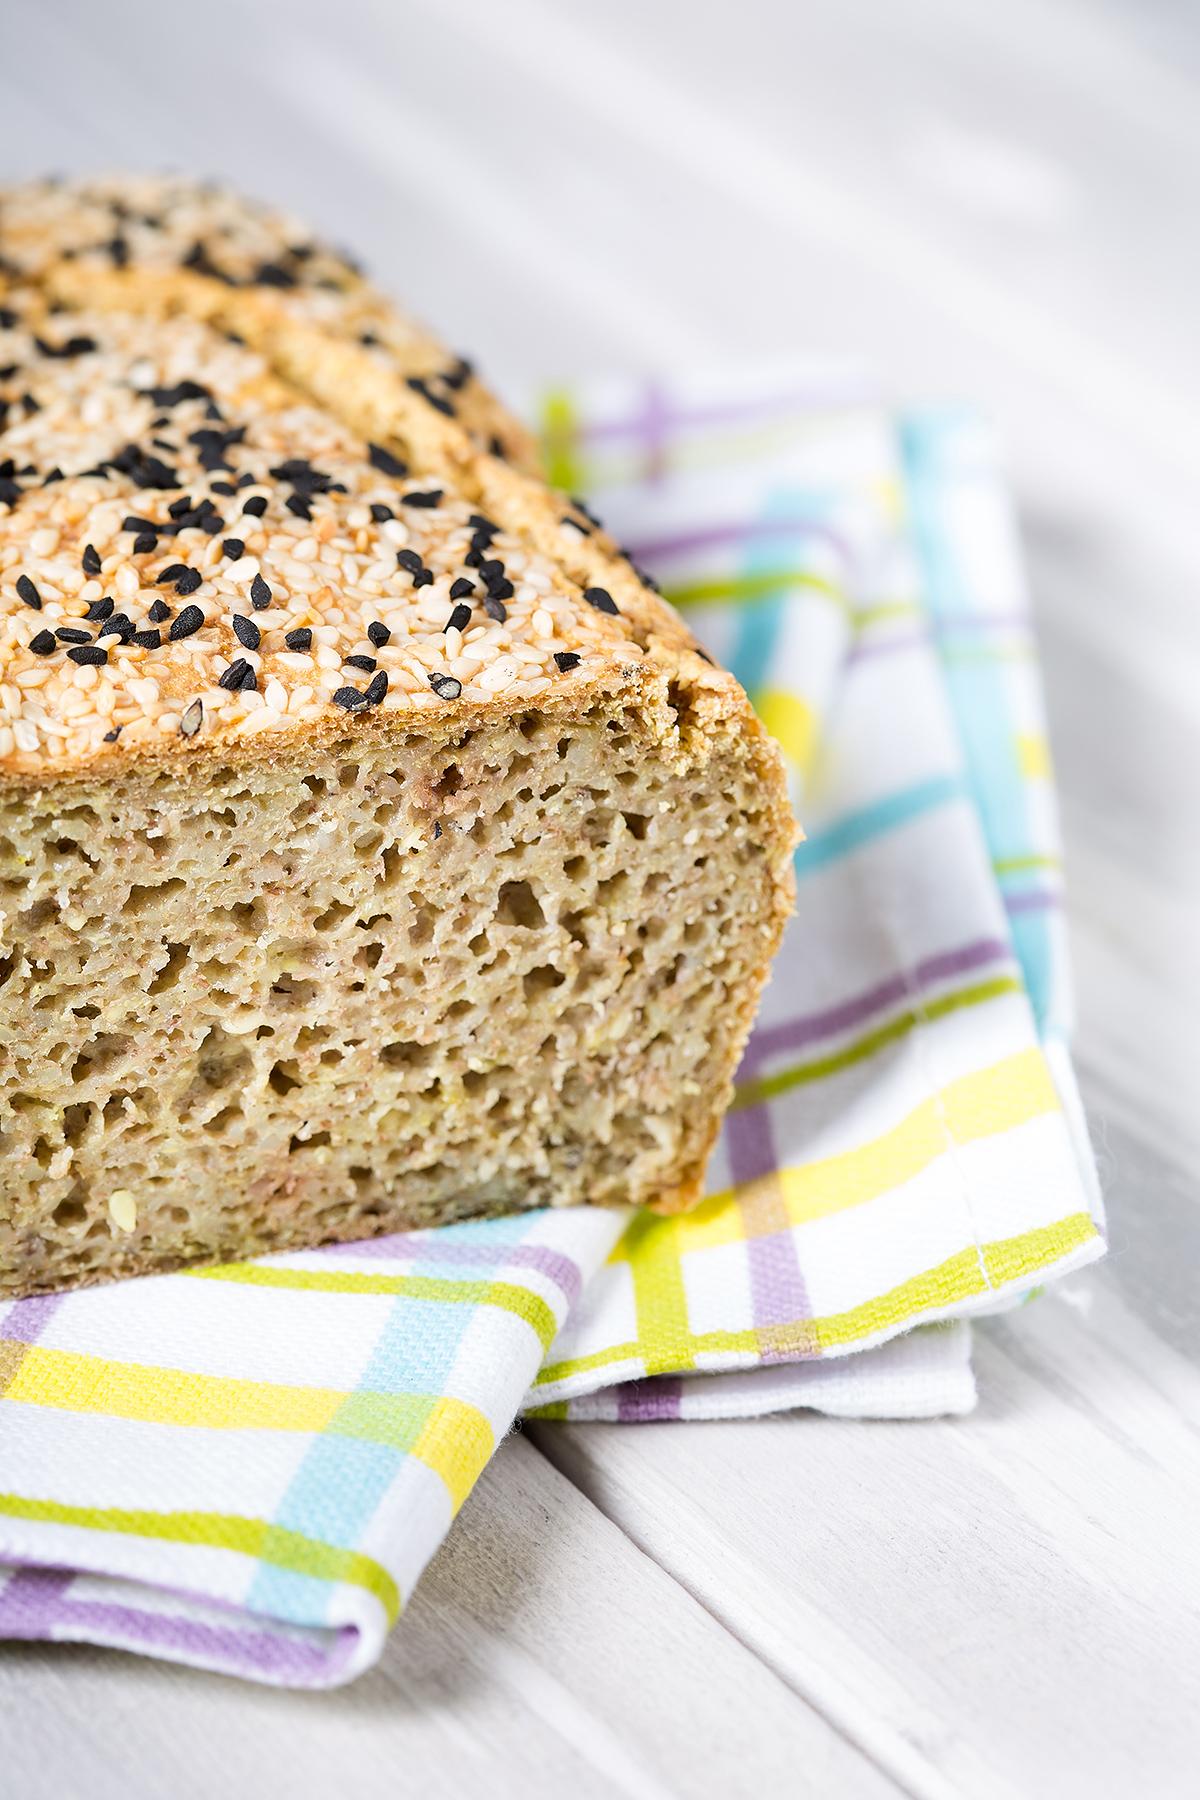 fotografia kulinarna slask bezglutenowy chleb 3 Fotografia kulinarna Śląsk   pieczywo bezglutenowe